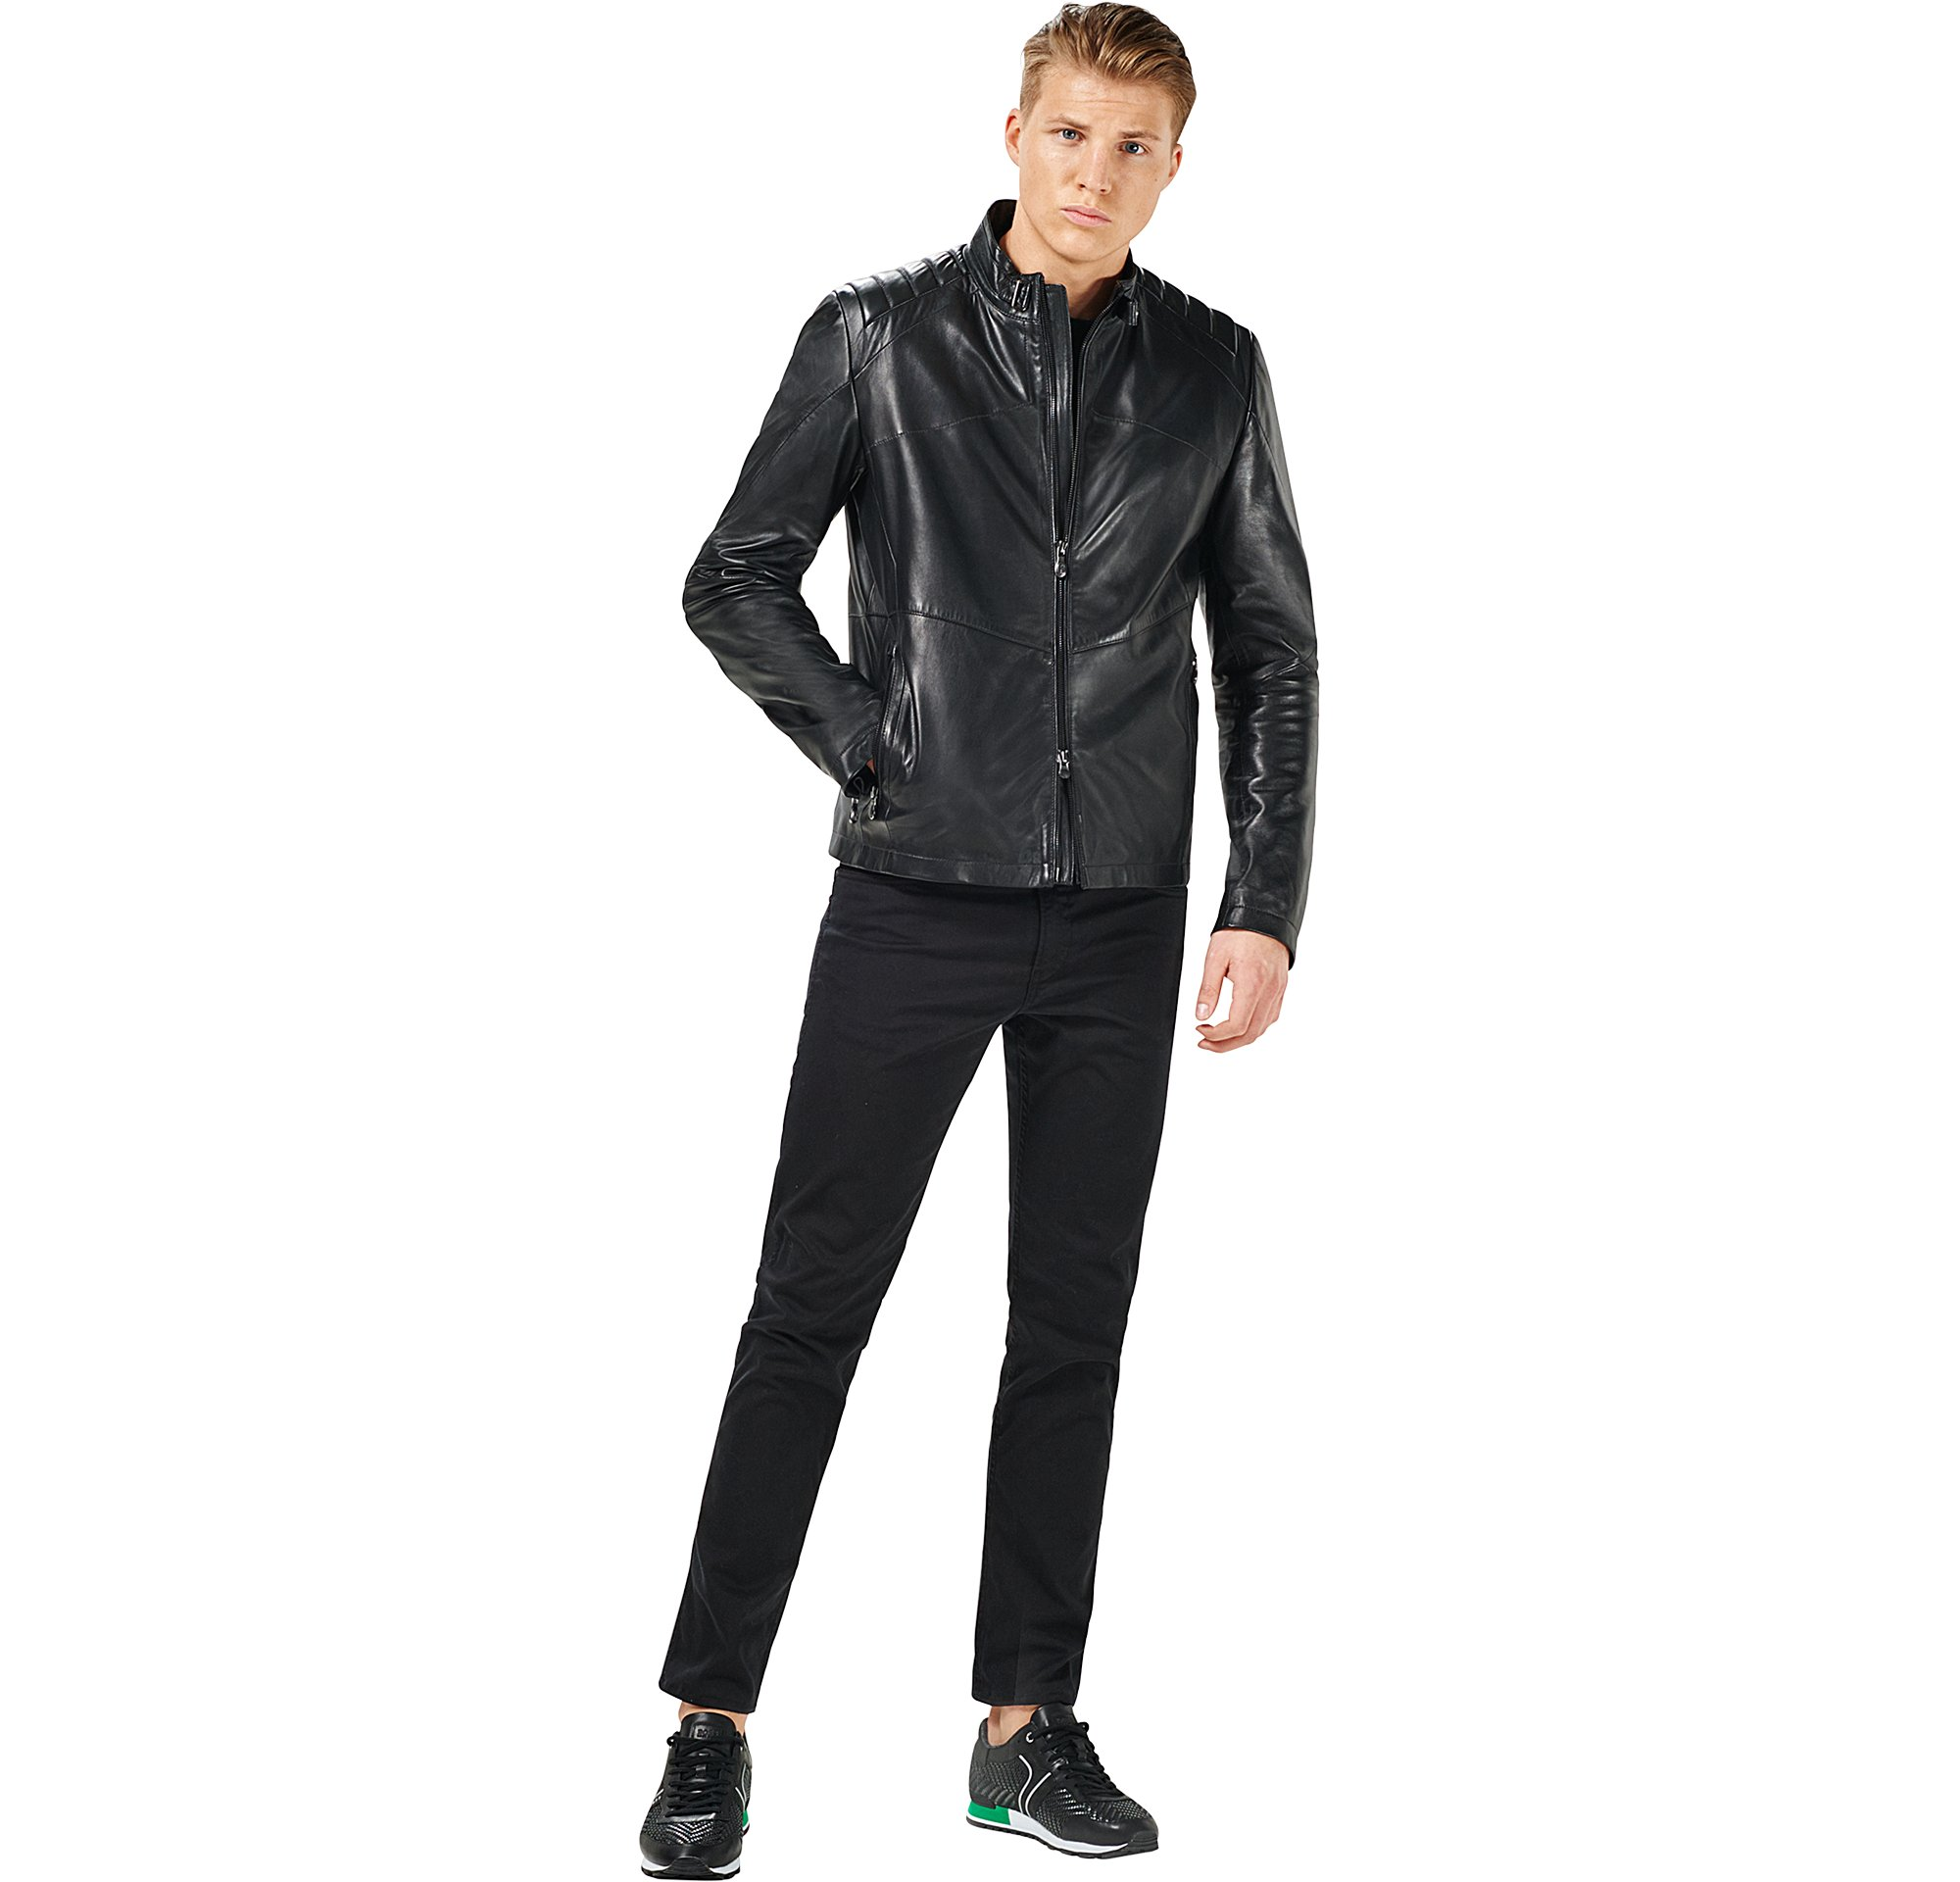 Lederjacke, Strick, Jeans und Schuhe von BOSS Green Menswear